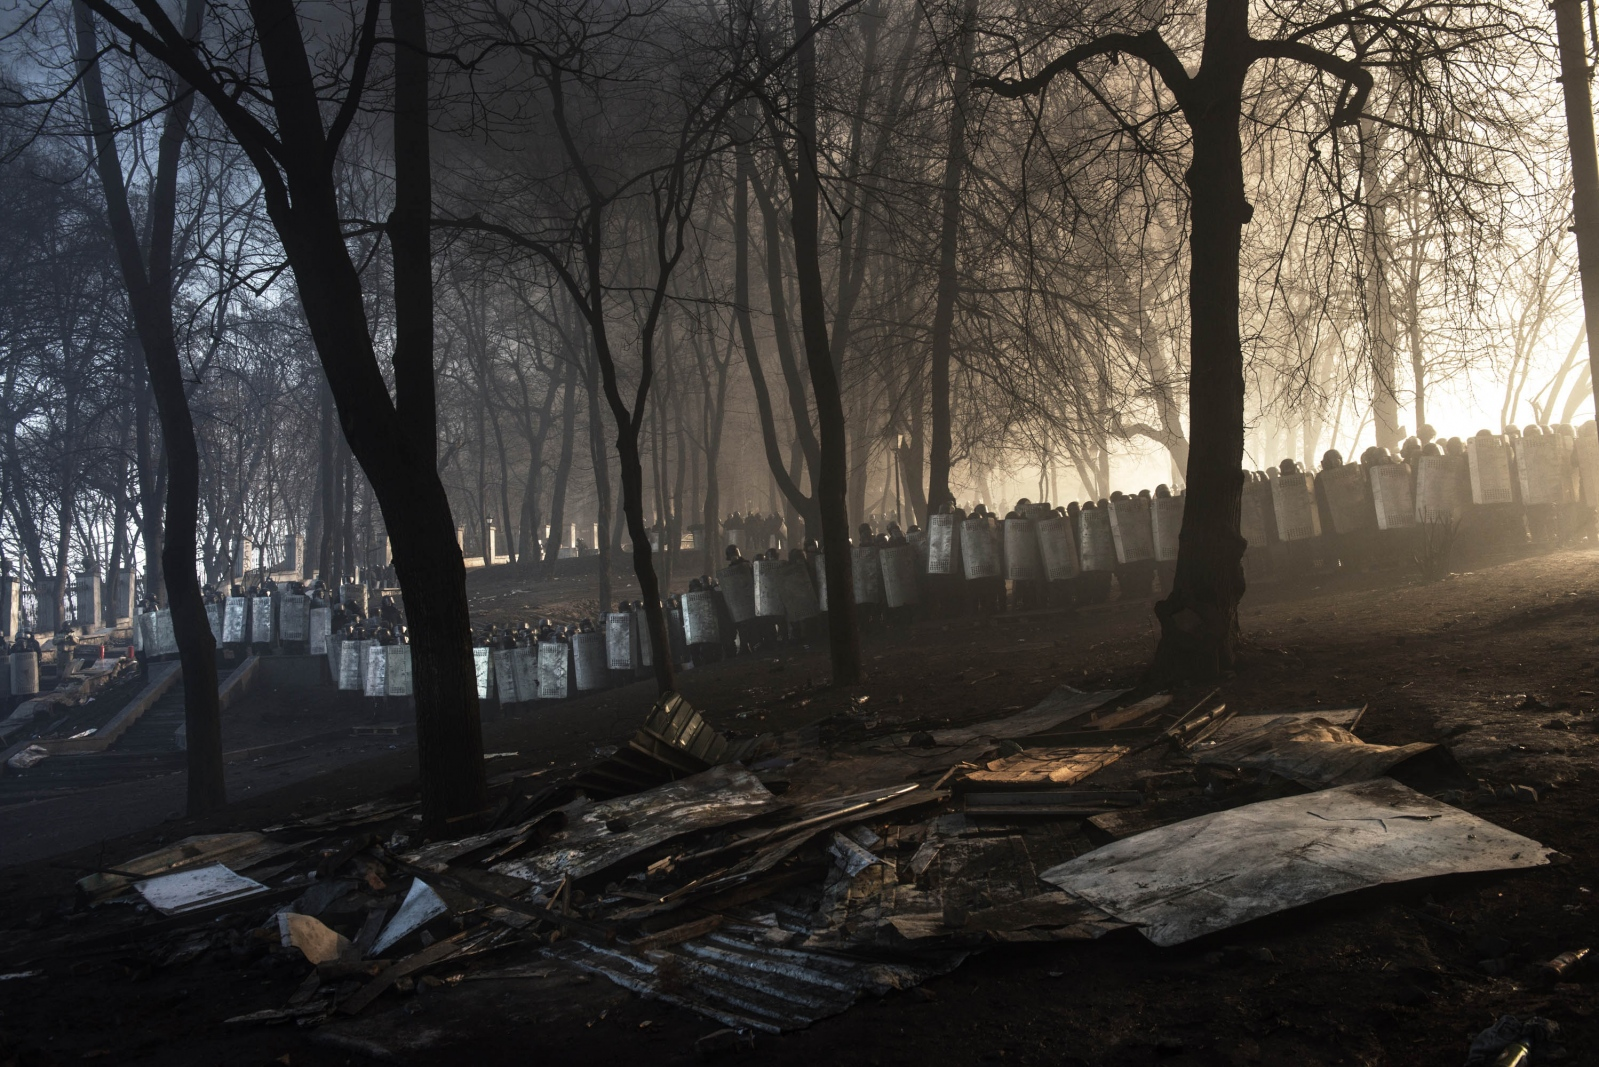 Art and Documentary Photography - Loading Behind_Kiev_s_barricades_003.jpg